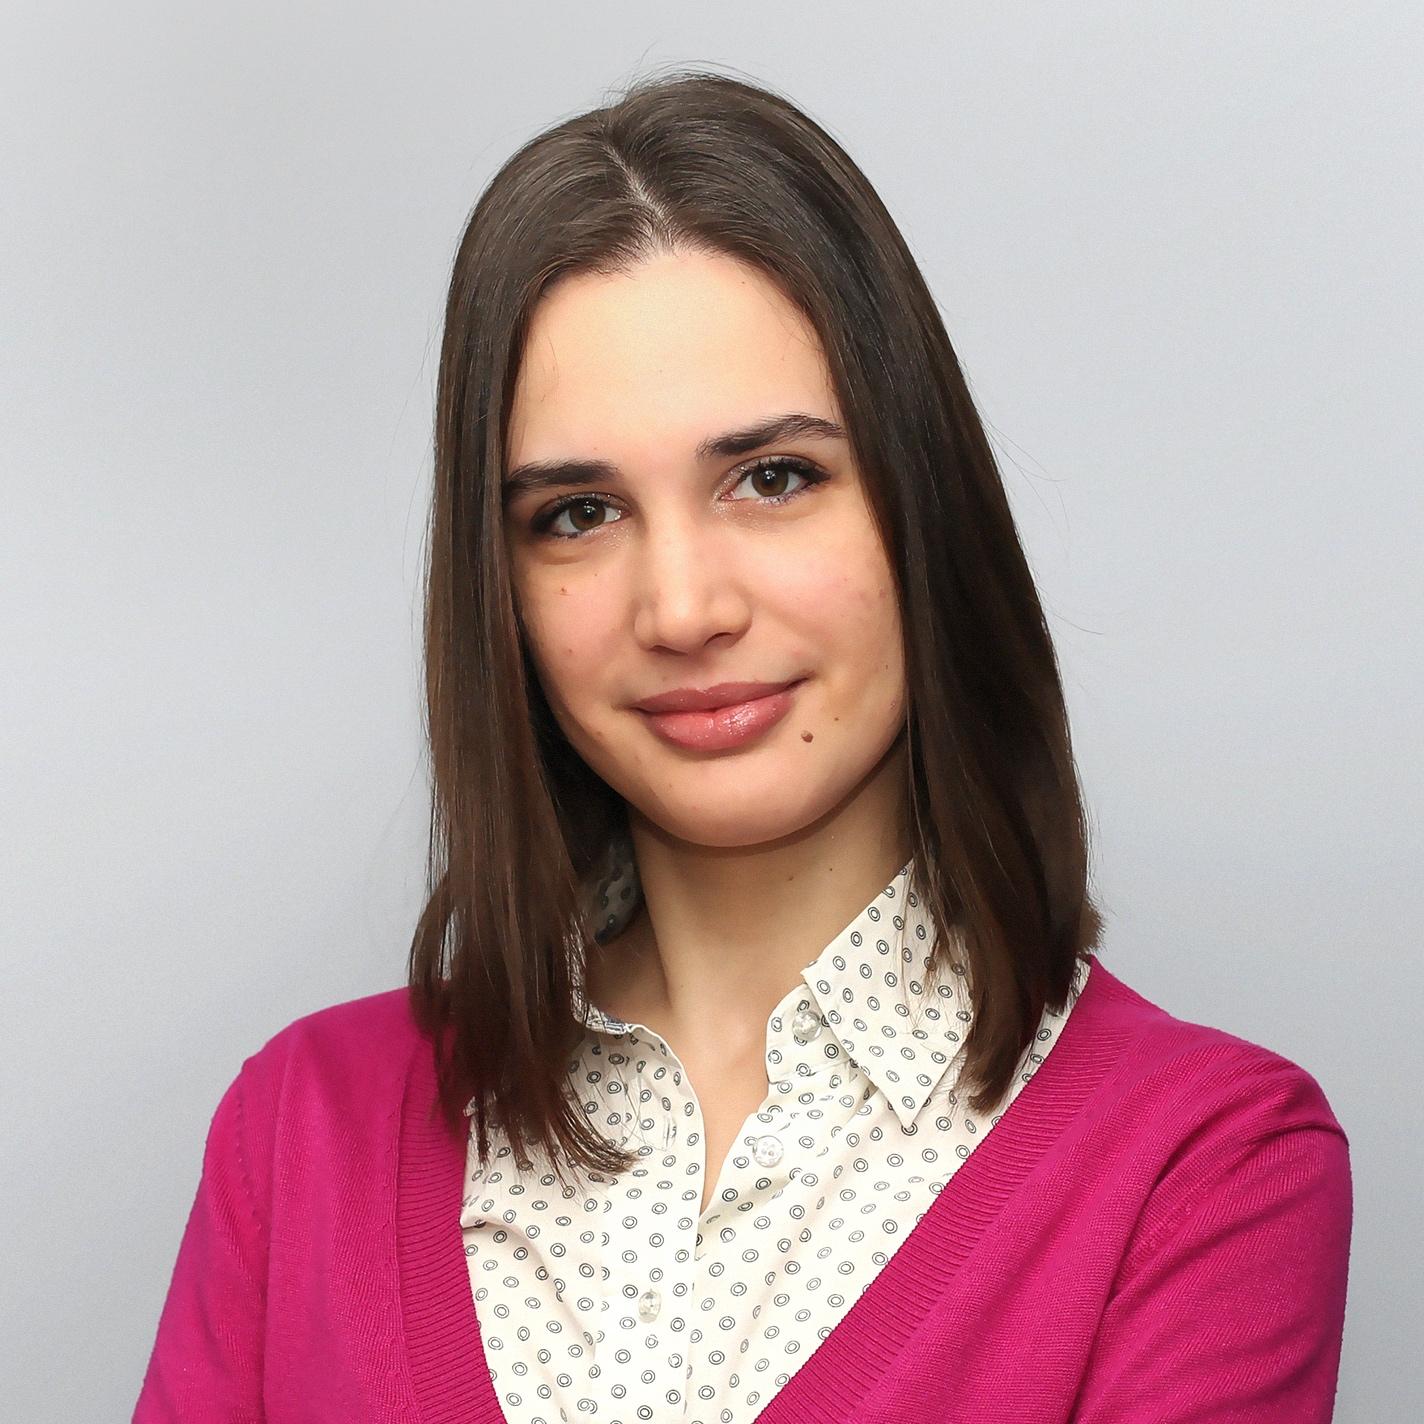 Короткевич Дарья Олеговна